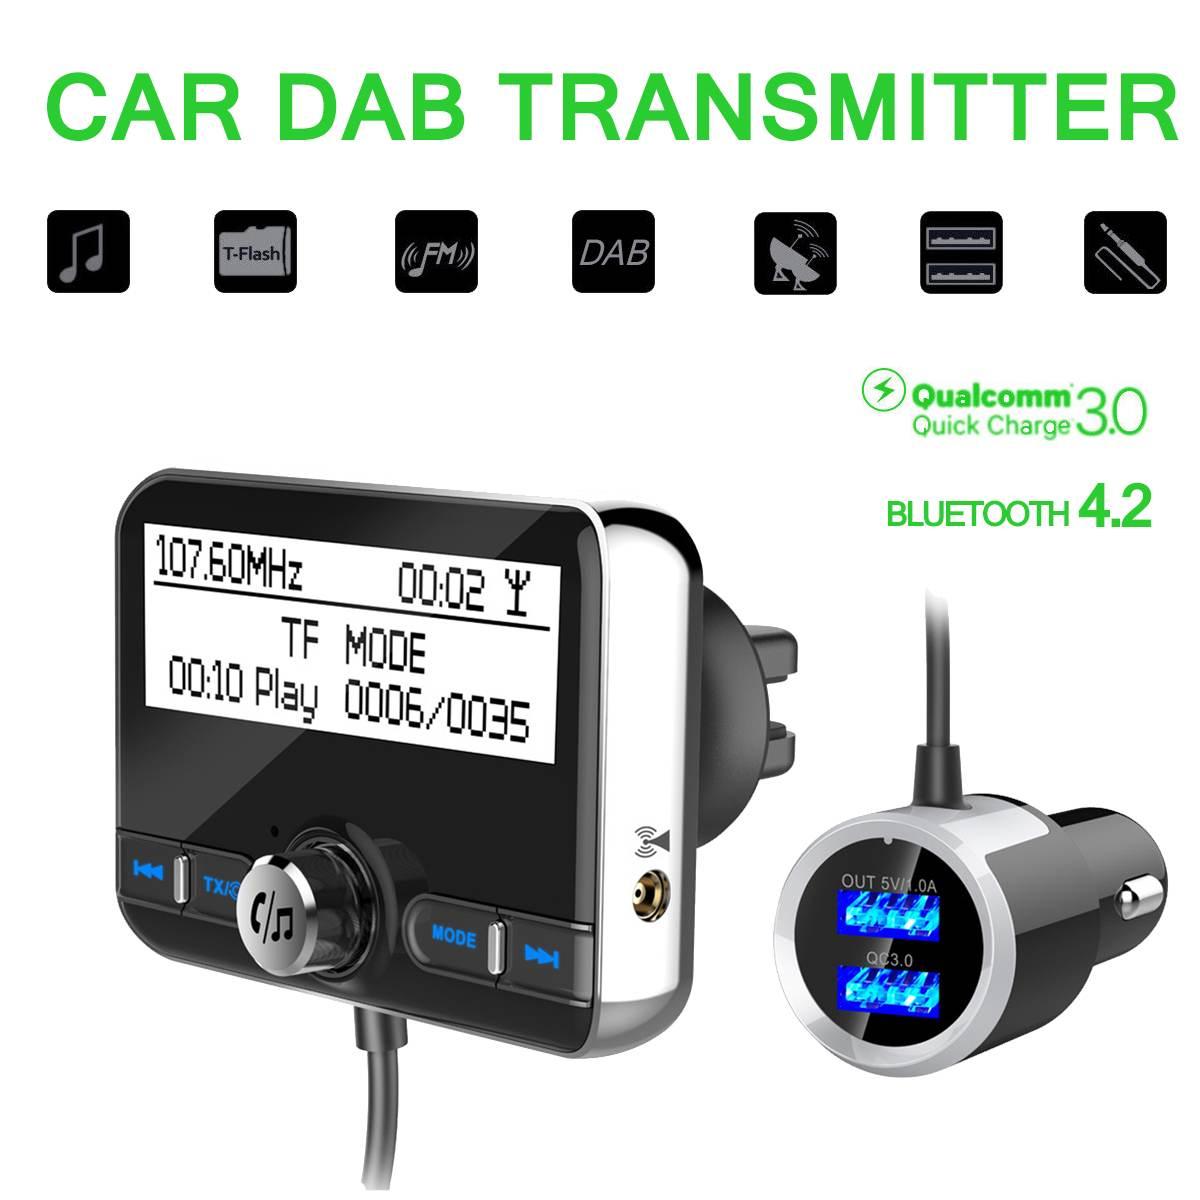 Gehorsam Multi-funktion Auto Dab-radio Receiver Tuner Usb Adapter Bluetooth Fm Sender Antenne Lcd Digital Radio Freisprechen Duftendes Aroma In